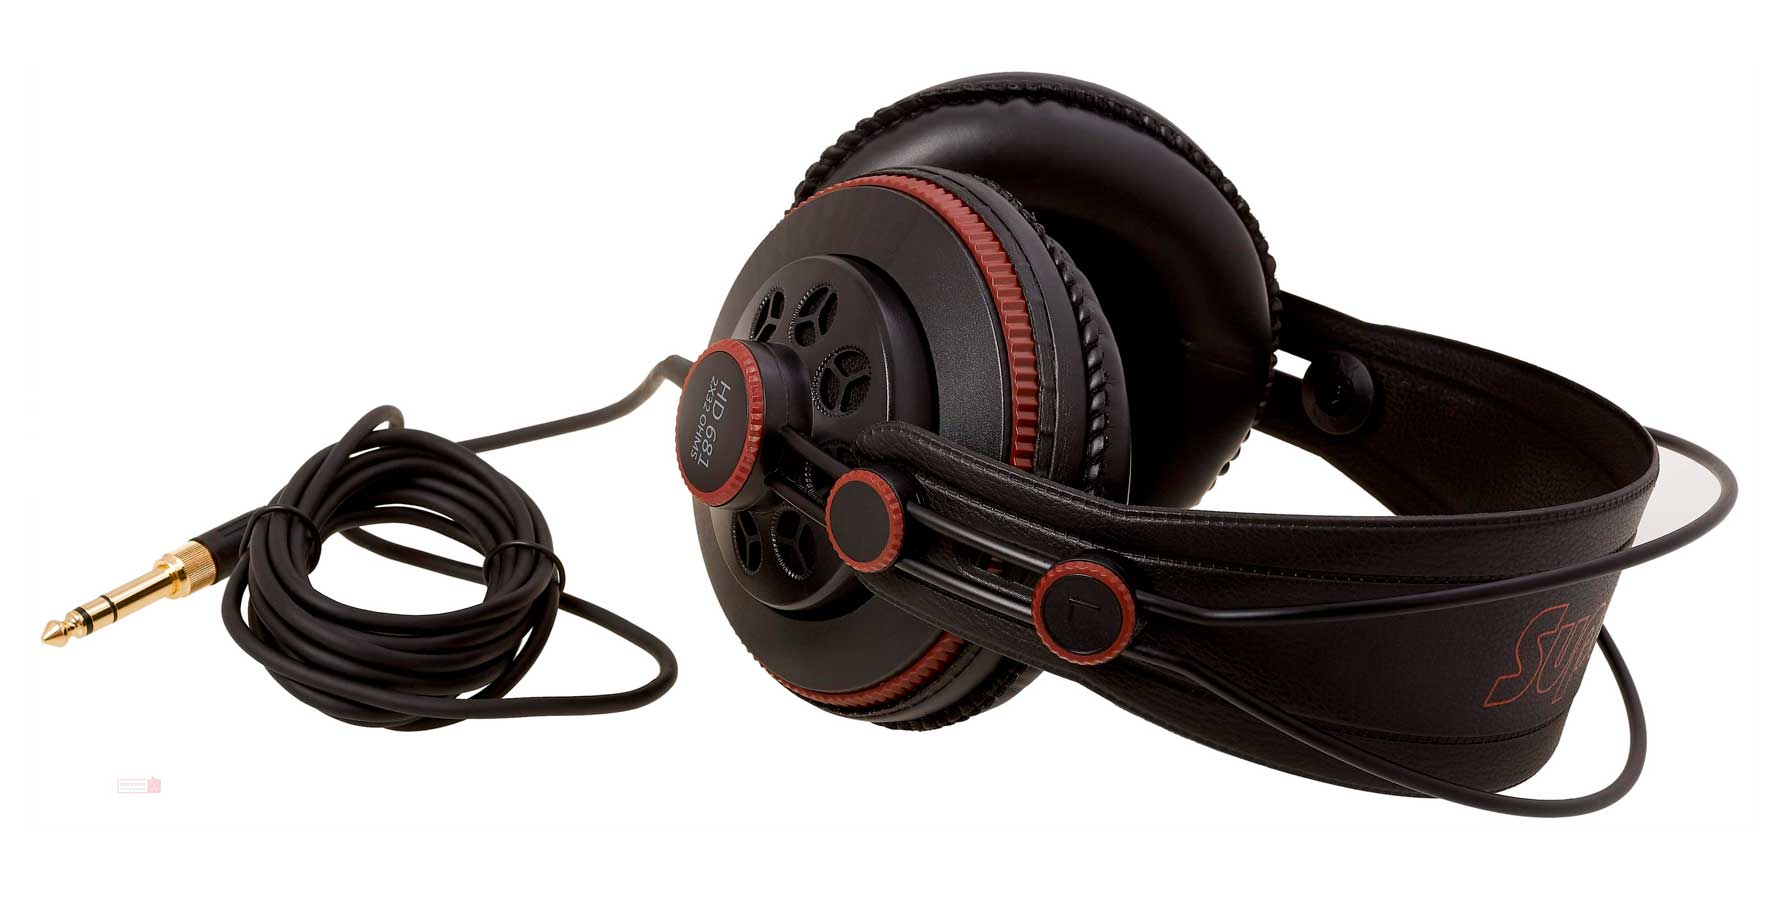 Kit Fone + Microfone de lapela + adaptador para celular | Superlux - Audio Technica | HD681 - ATR3350IS